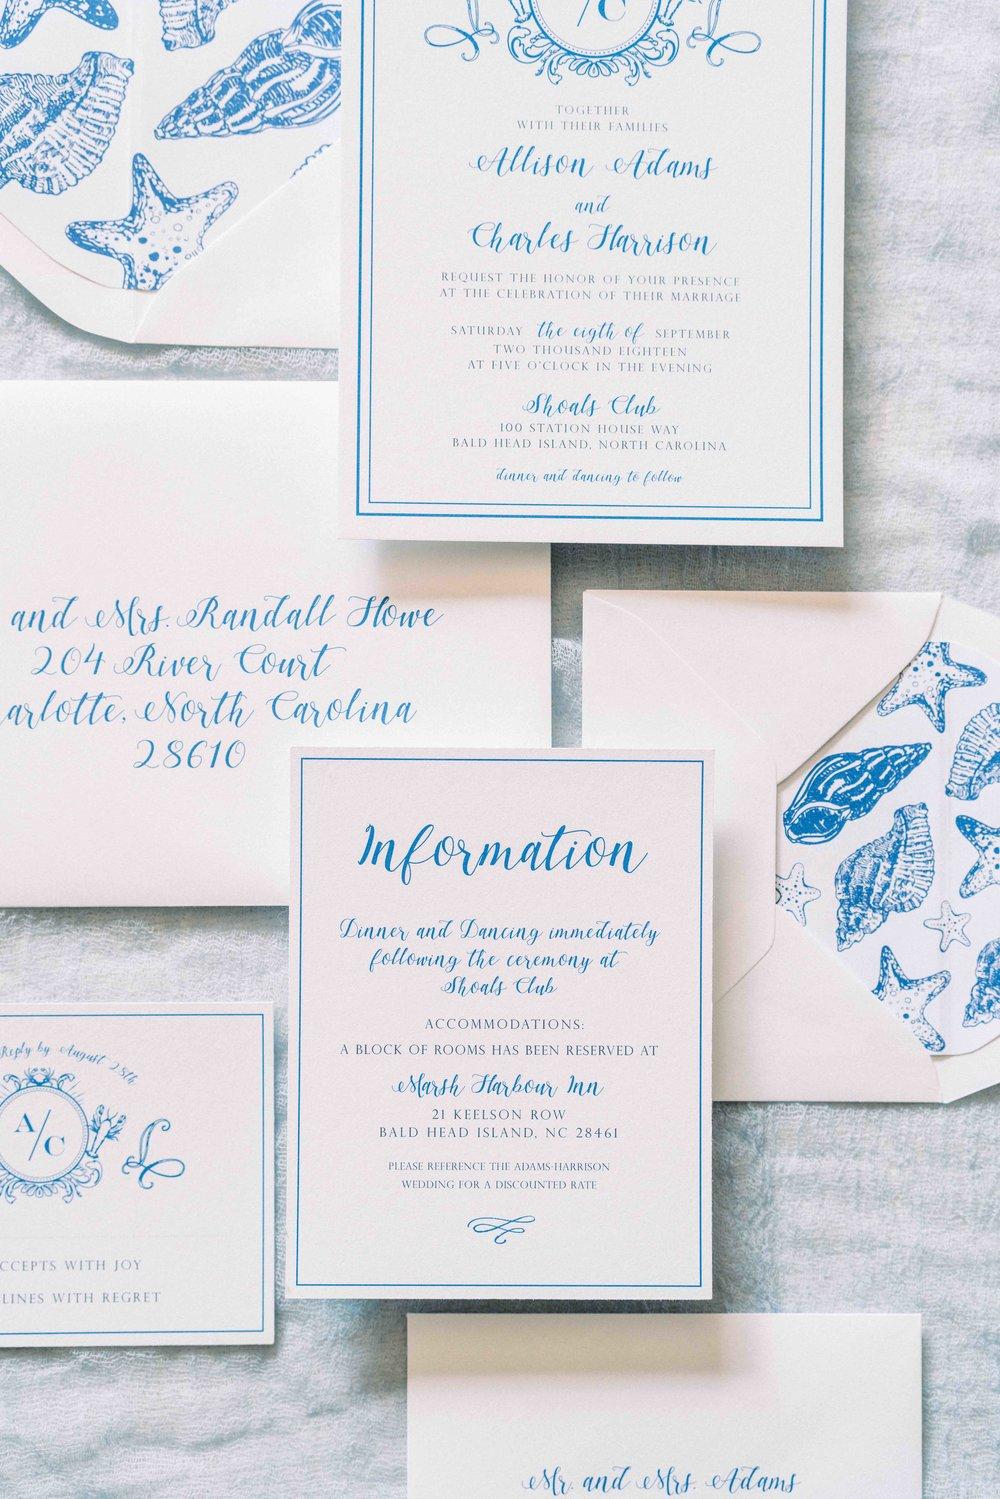 Blue and White Beach Wedding Invitation Suite by Prim Pretty Prints